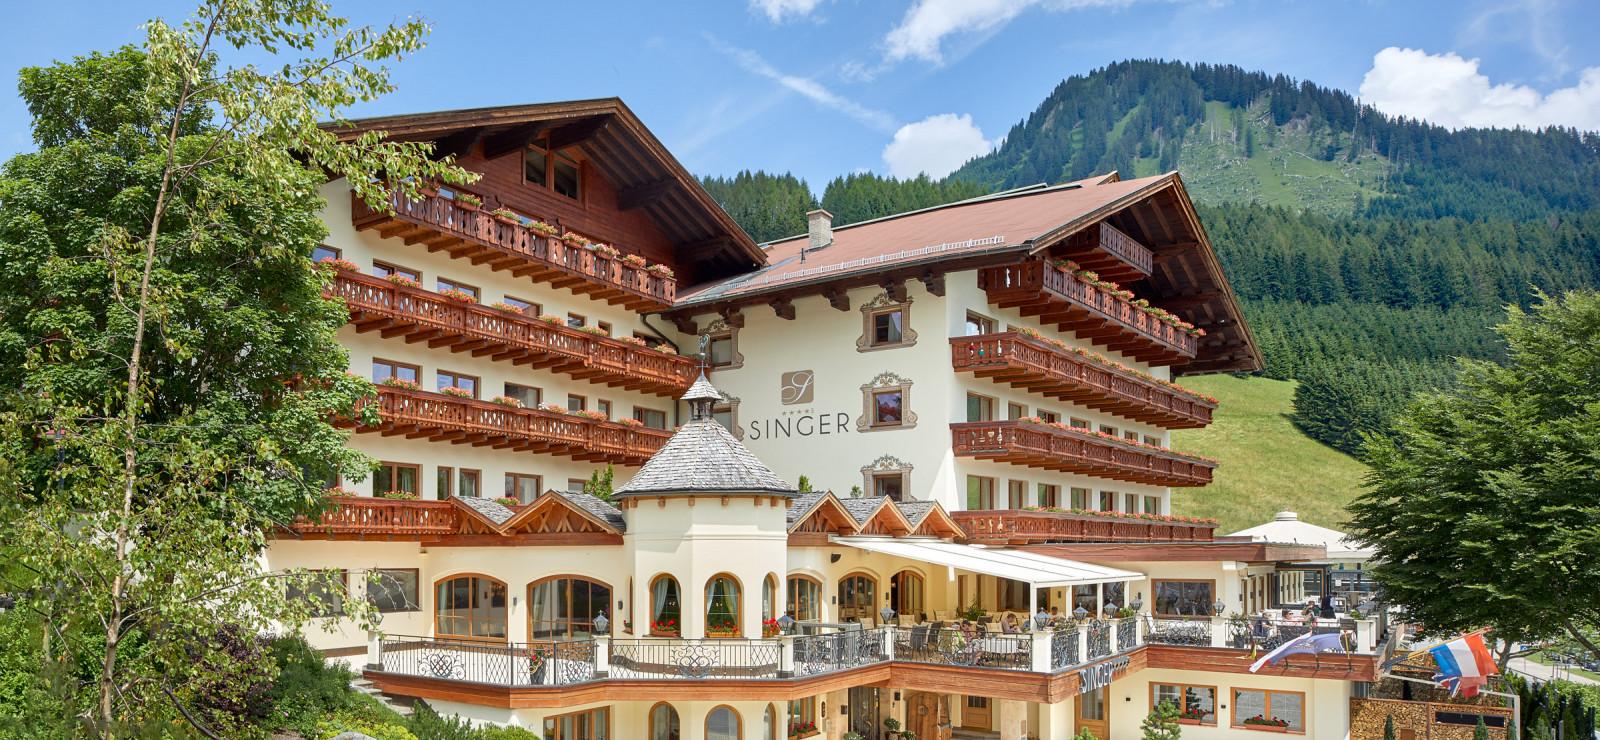 Hotel Singer – Relais & Châteaux ****S Bilder | Bild 1